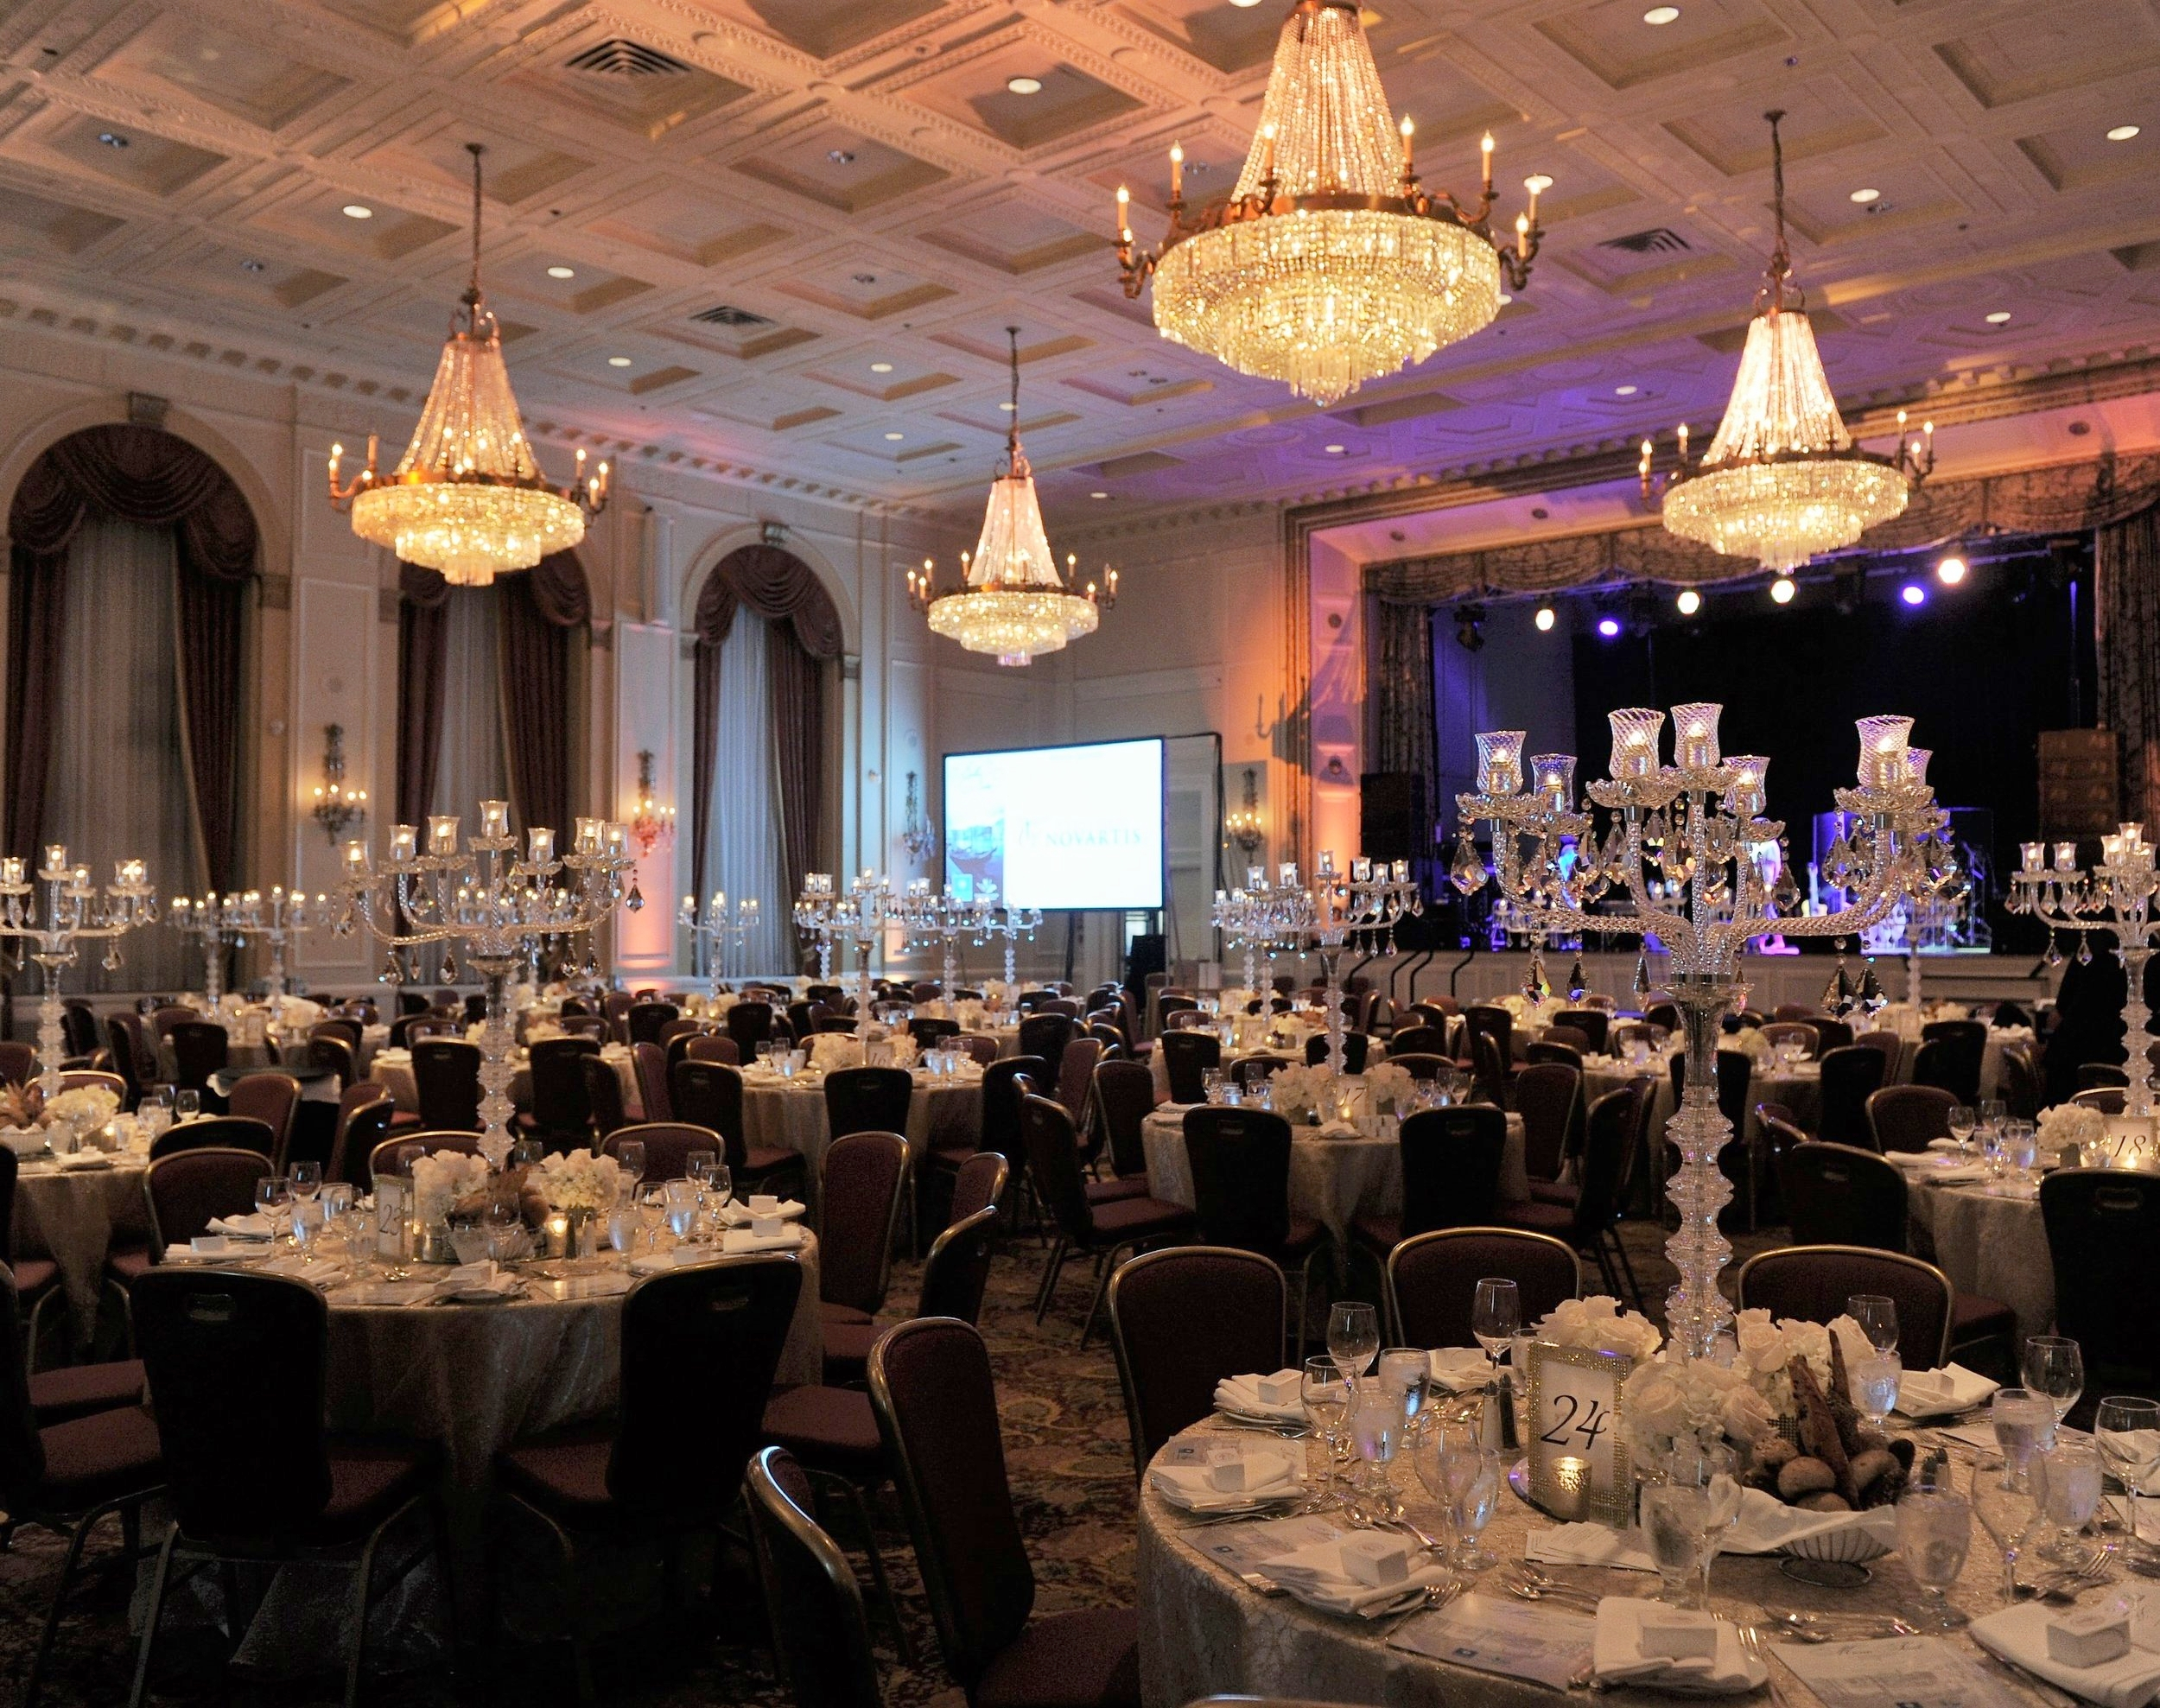 KFOC Bella Notte Gala, The Royal York Hotel, 2013